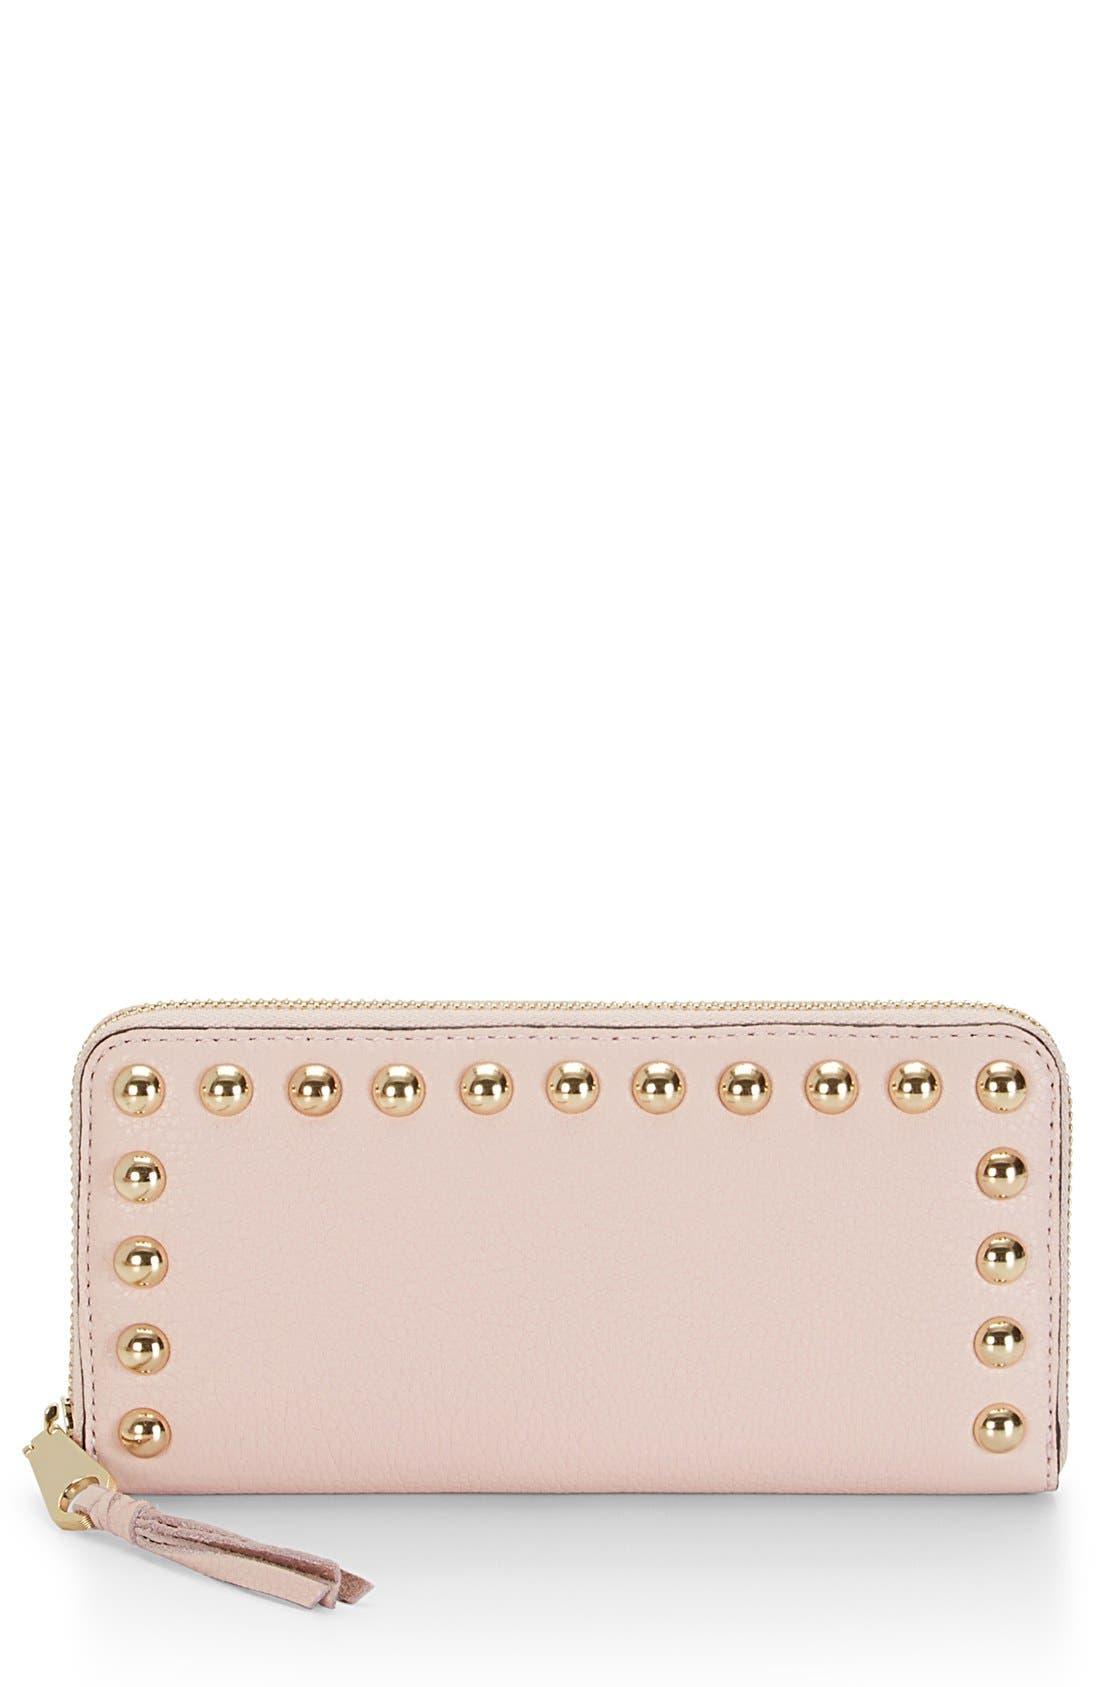 Alternate Image 1 Selected - Rebecca Minkoff 'Ava' Zip Wallet